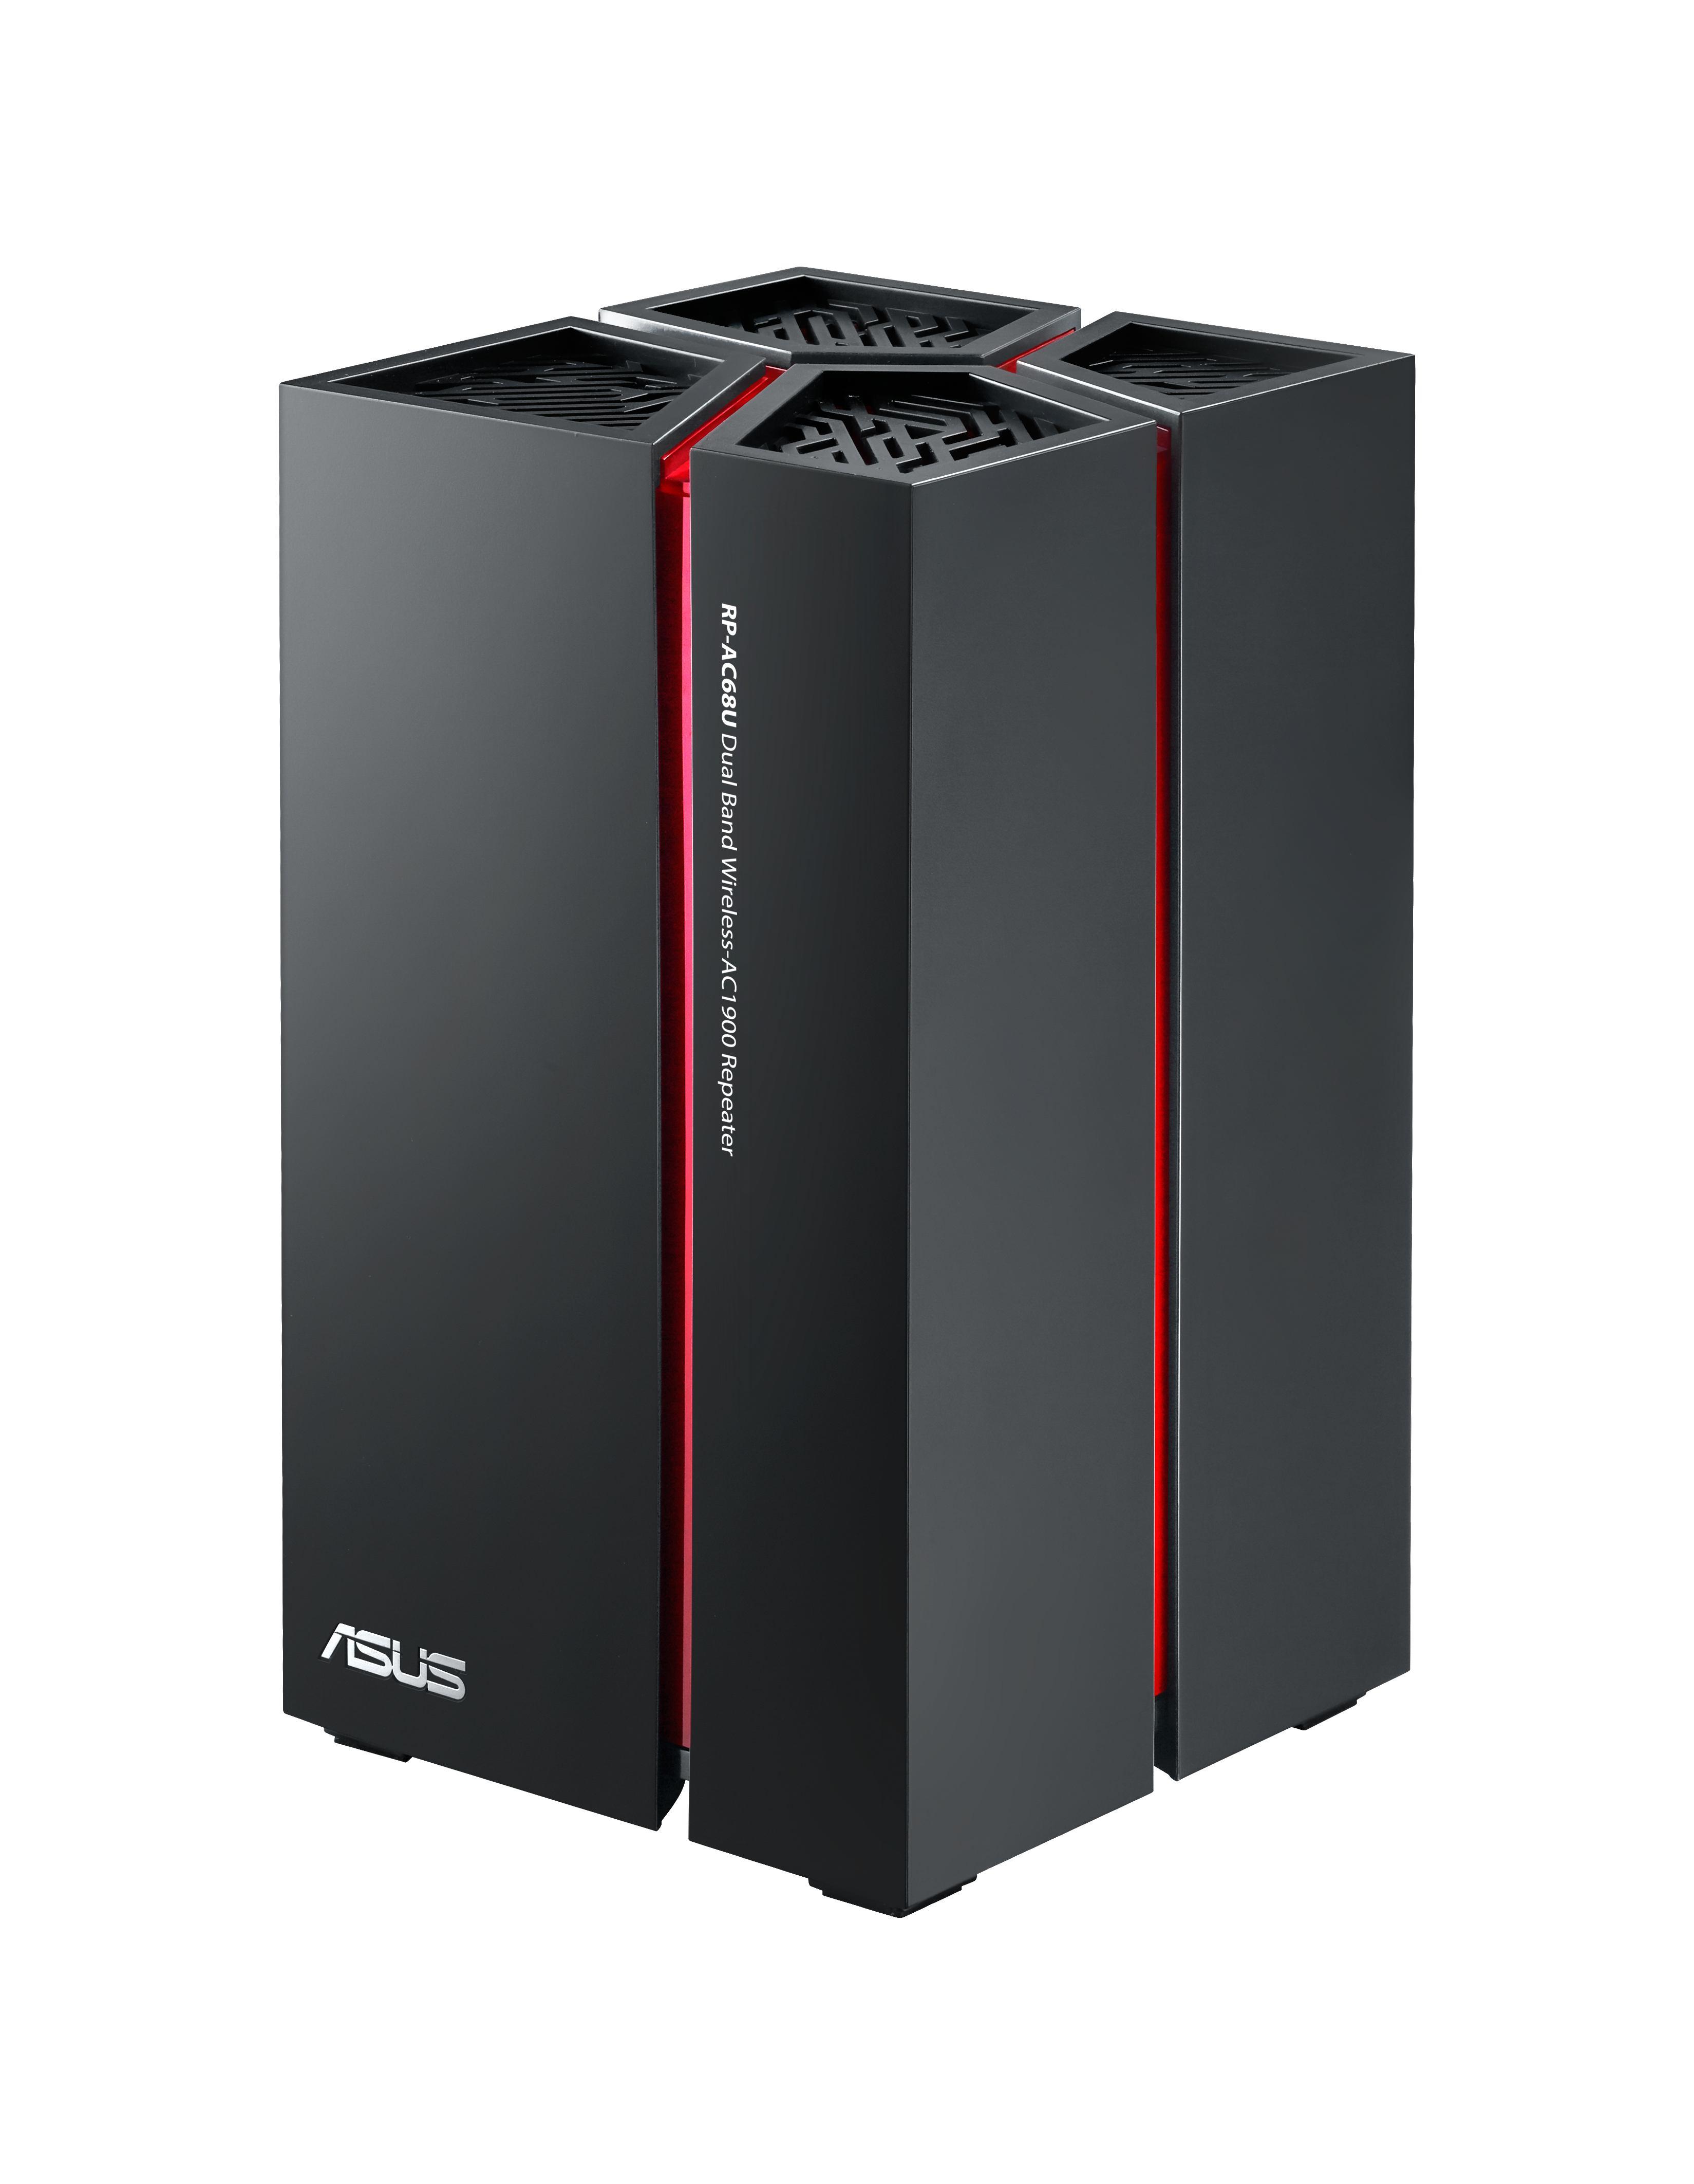 2022274-ASUS-RP-AC68U-Nero-Rosso-RP-AC68U-AC1900-WIRELESS-AC190-RP-AC68U-19